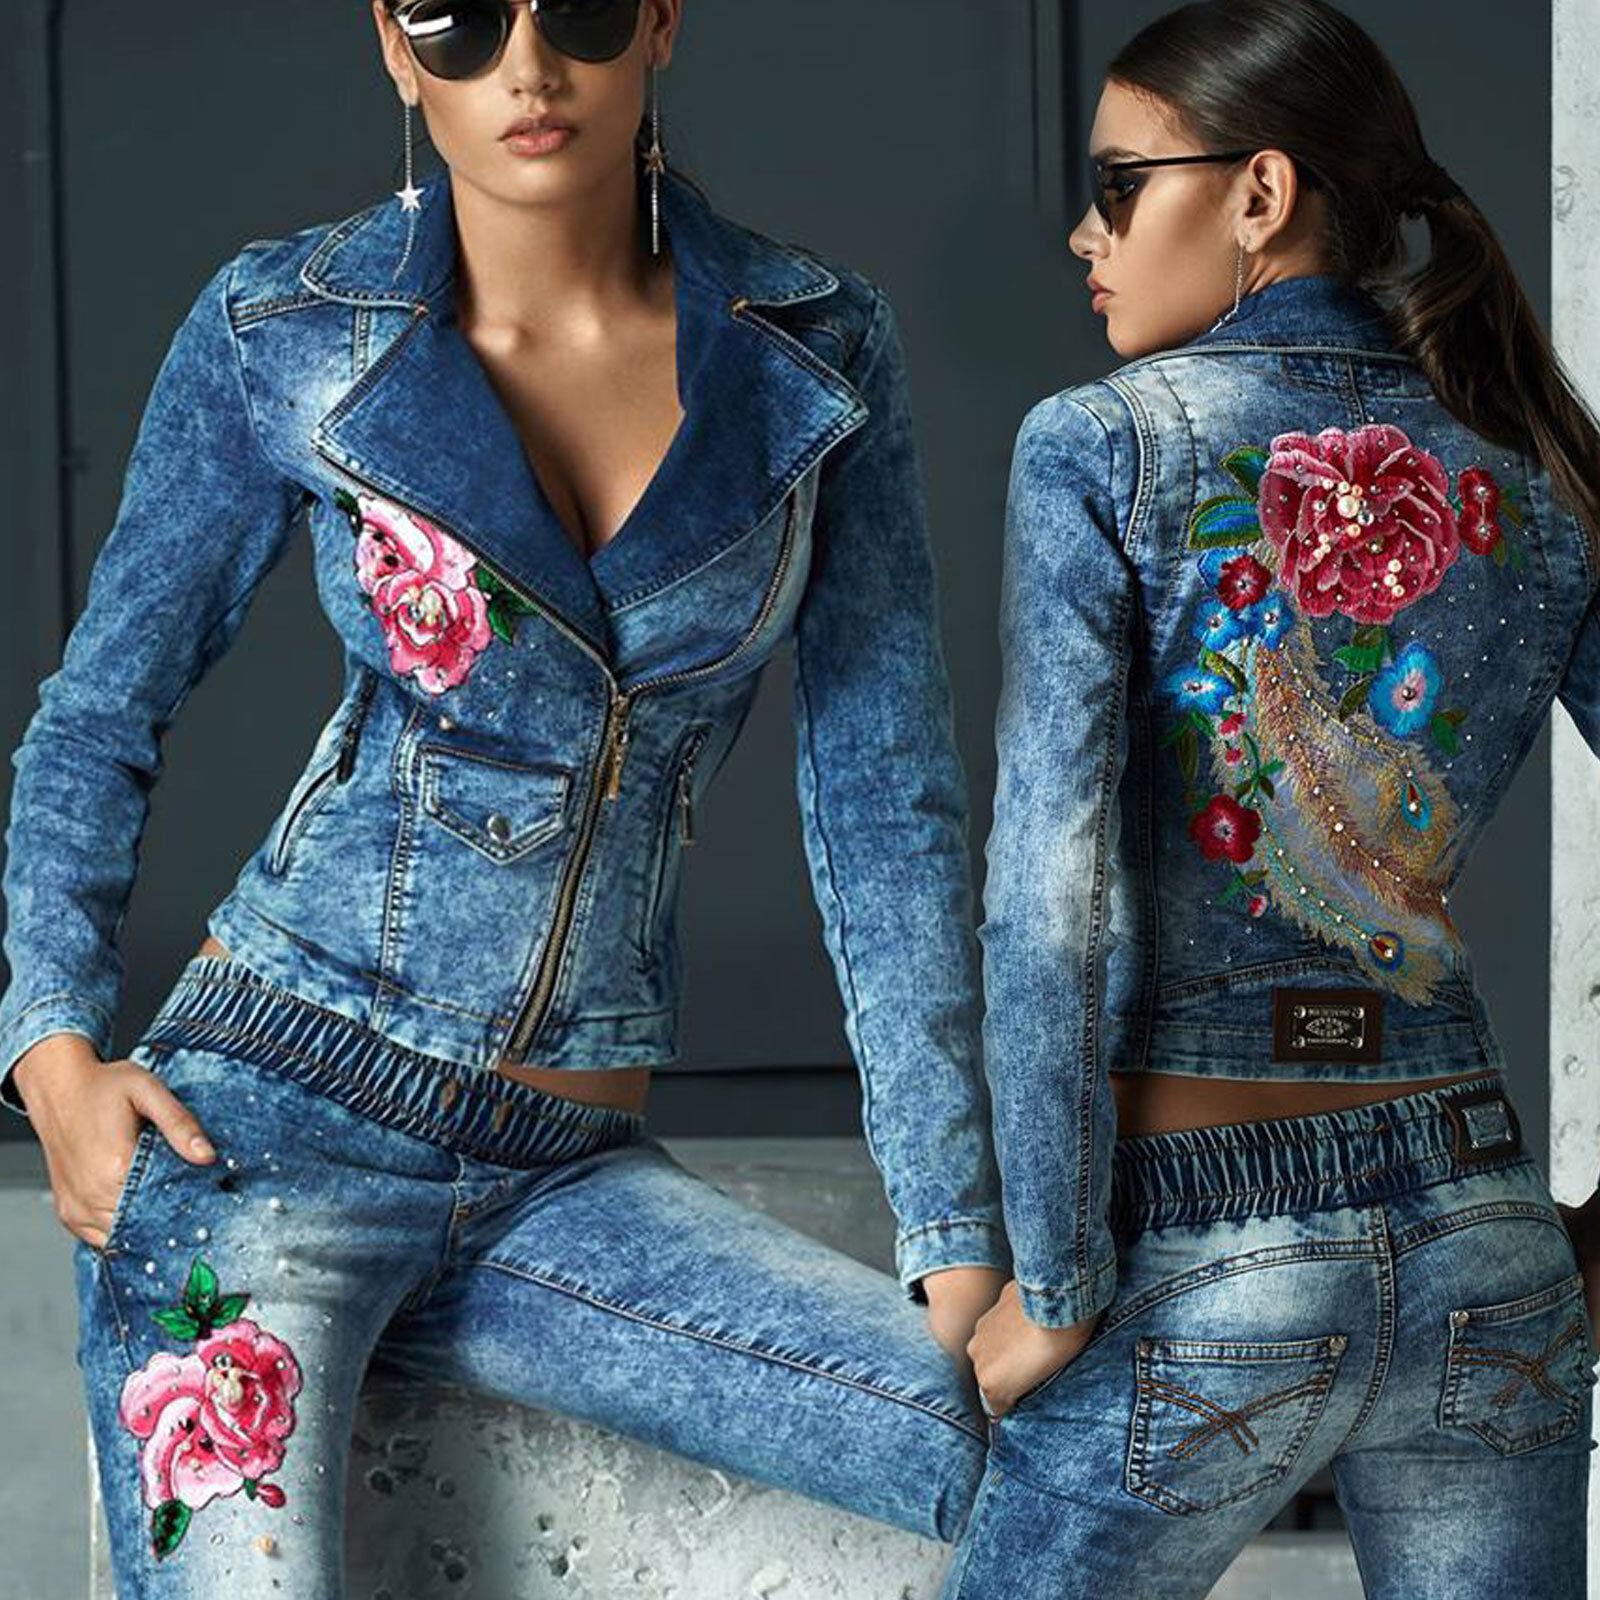 By Alina Jeans 2-Teiler Jeansjacke Jacke Röhrenjeans Hüftjeans Blau Rosa